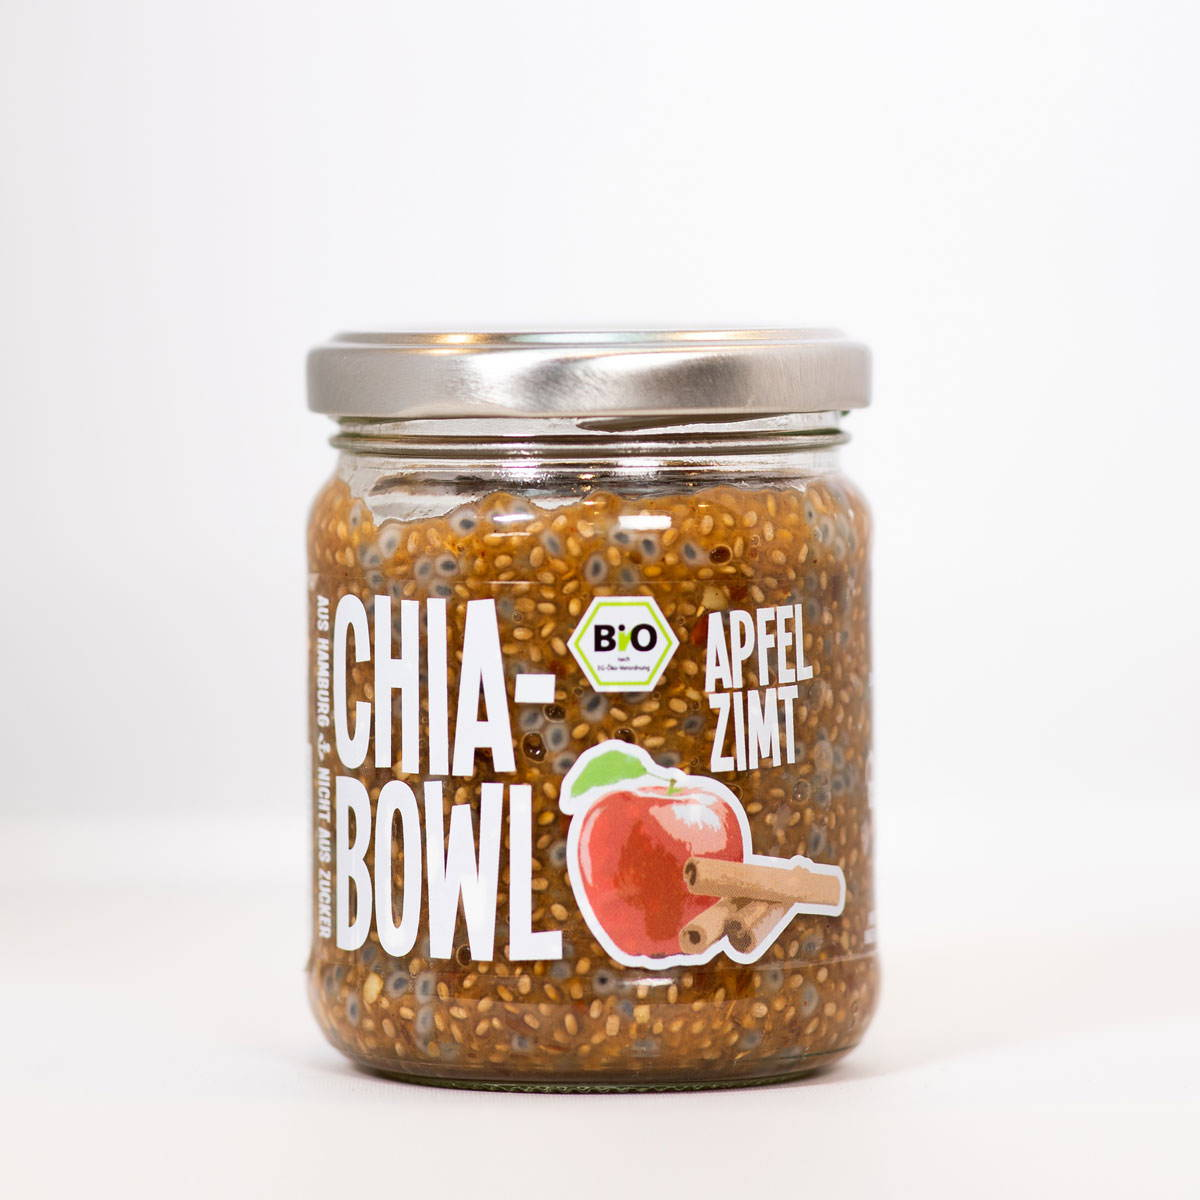 Chia Bowl Apfel Zimt